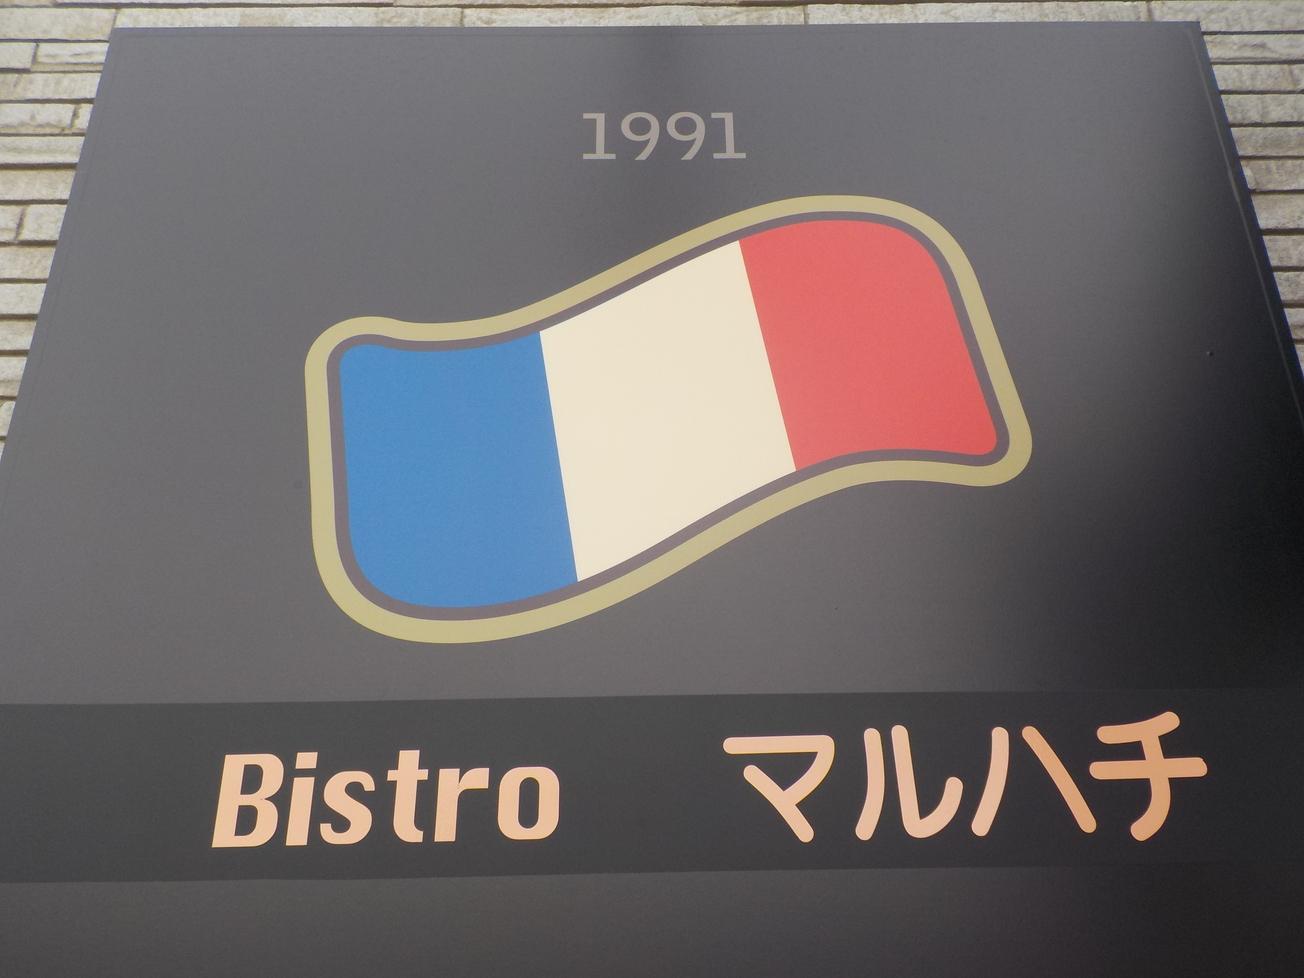 Bistro マルハチ